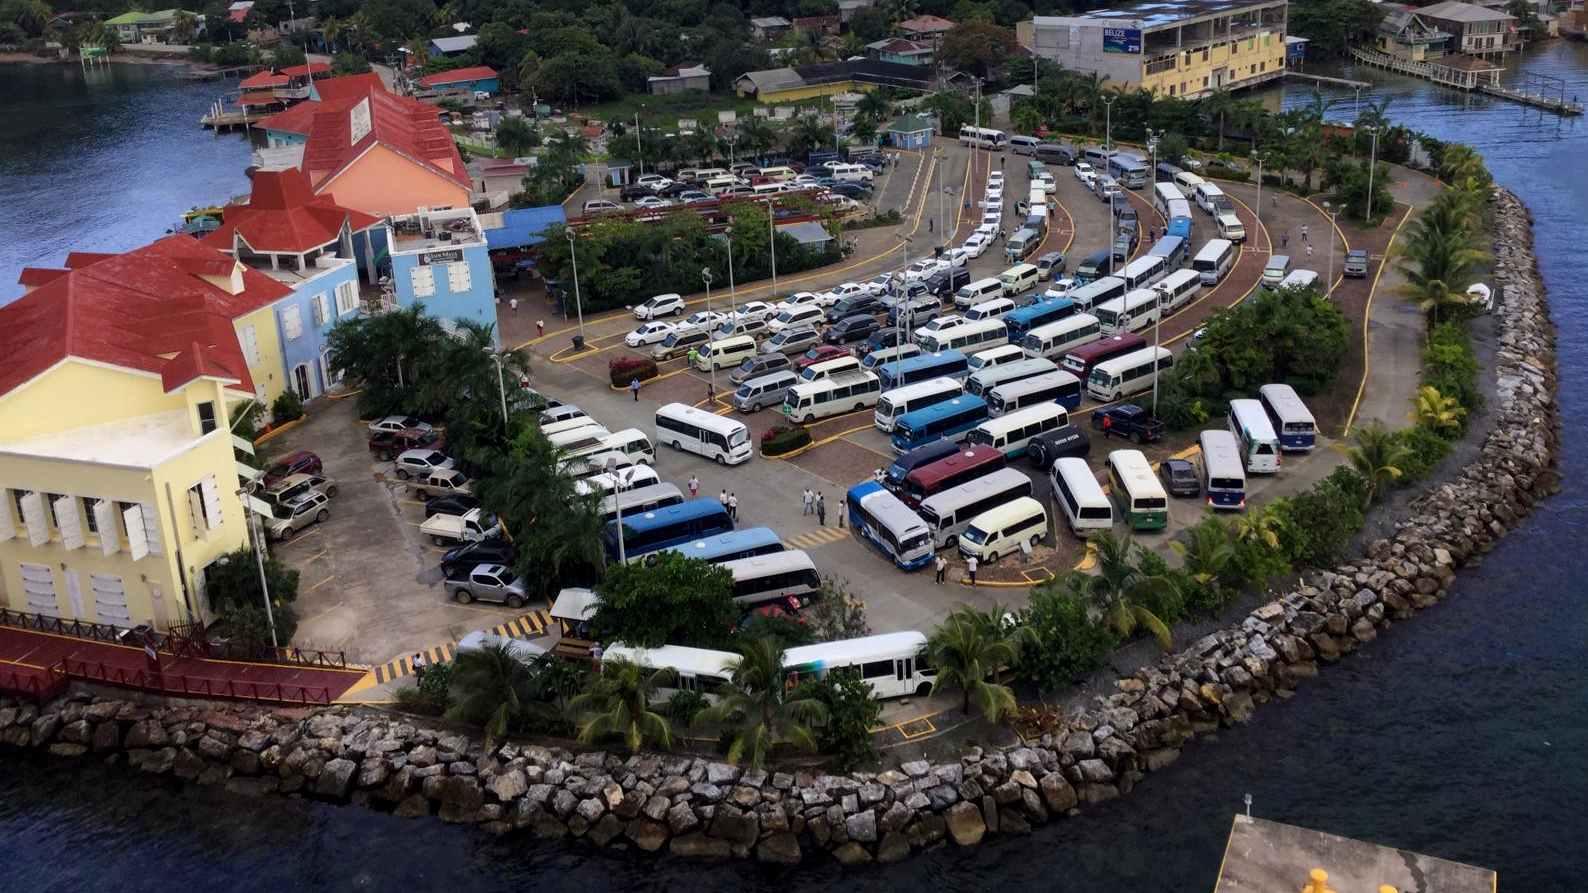 Taxen und Busse am Coxen Hole Main Pier